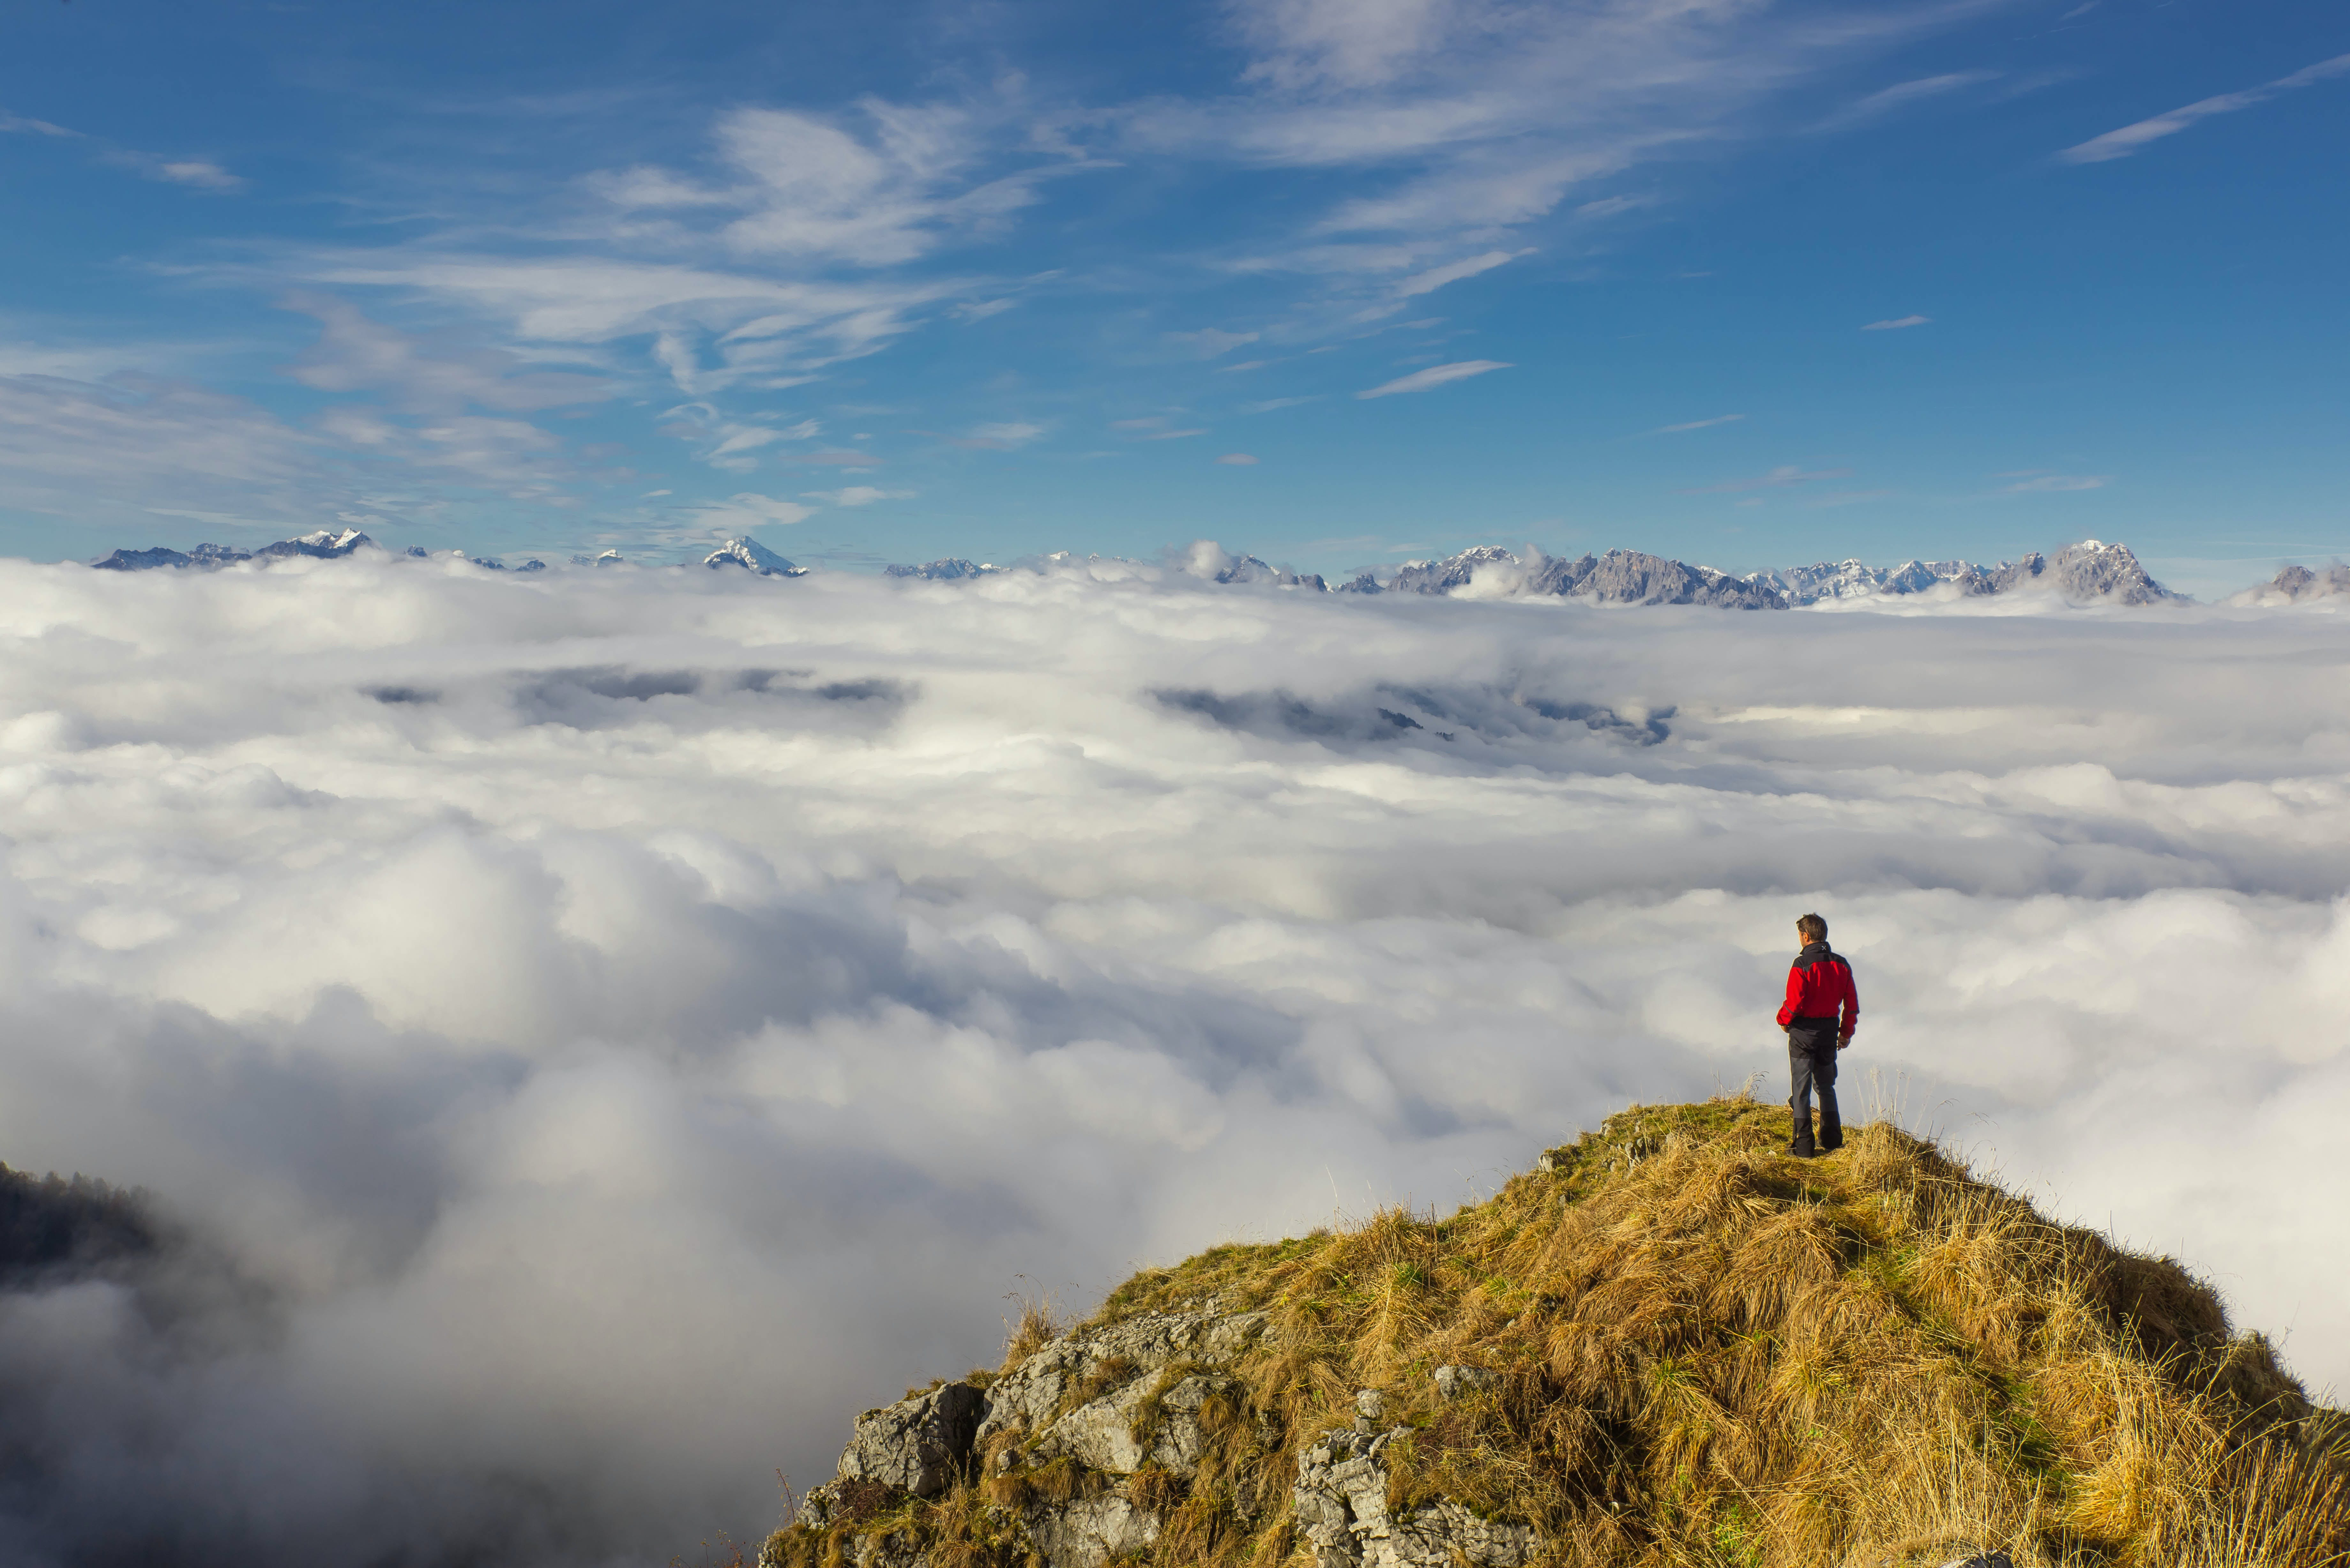 abenteuer, alpen, berg